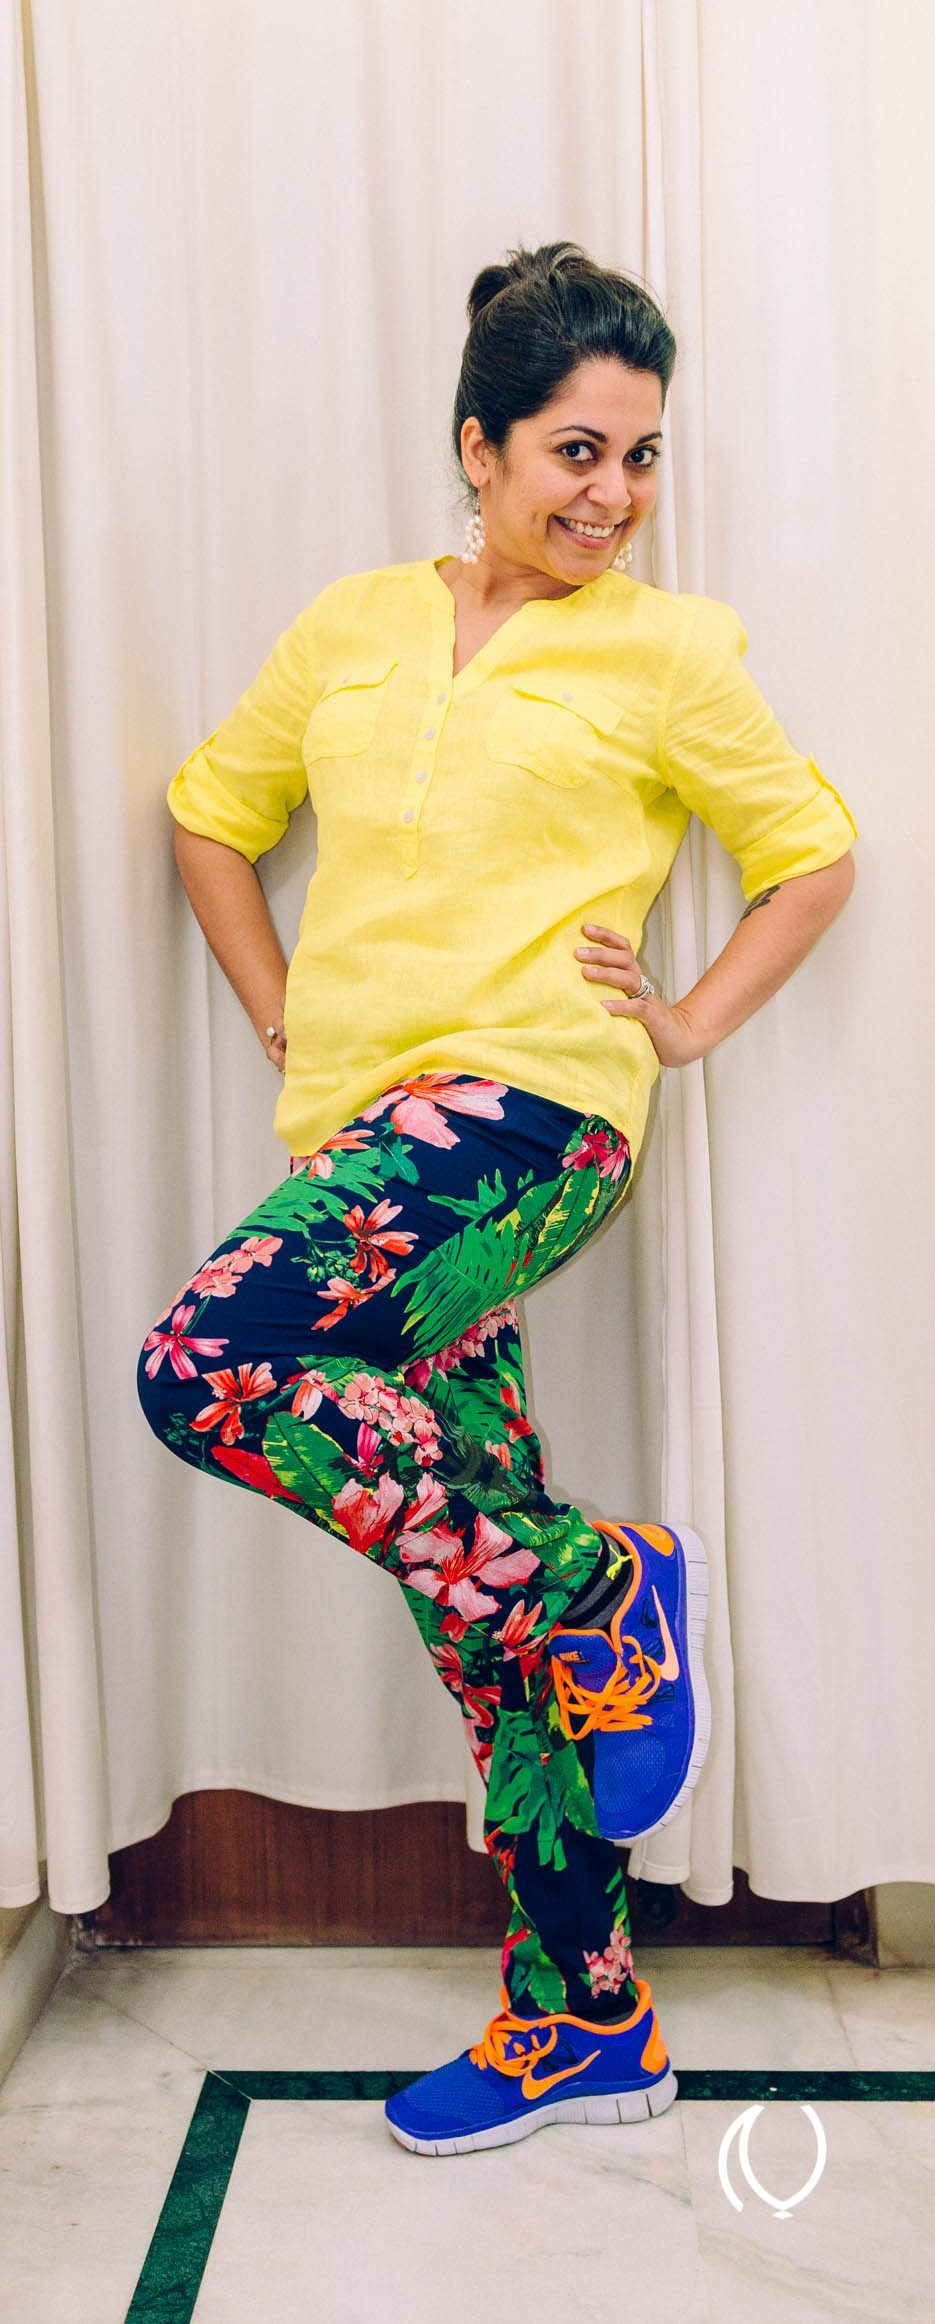 Naina.co-Luxury-Lifestyle-Branding-Photographer-Raconteuse-Visuelle-UK-Britain-EyesForLondon-London-Travel-Raconteuse-Visuelle